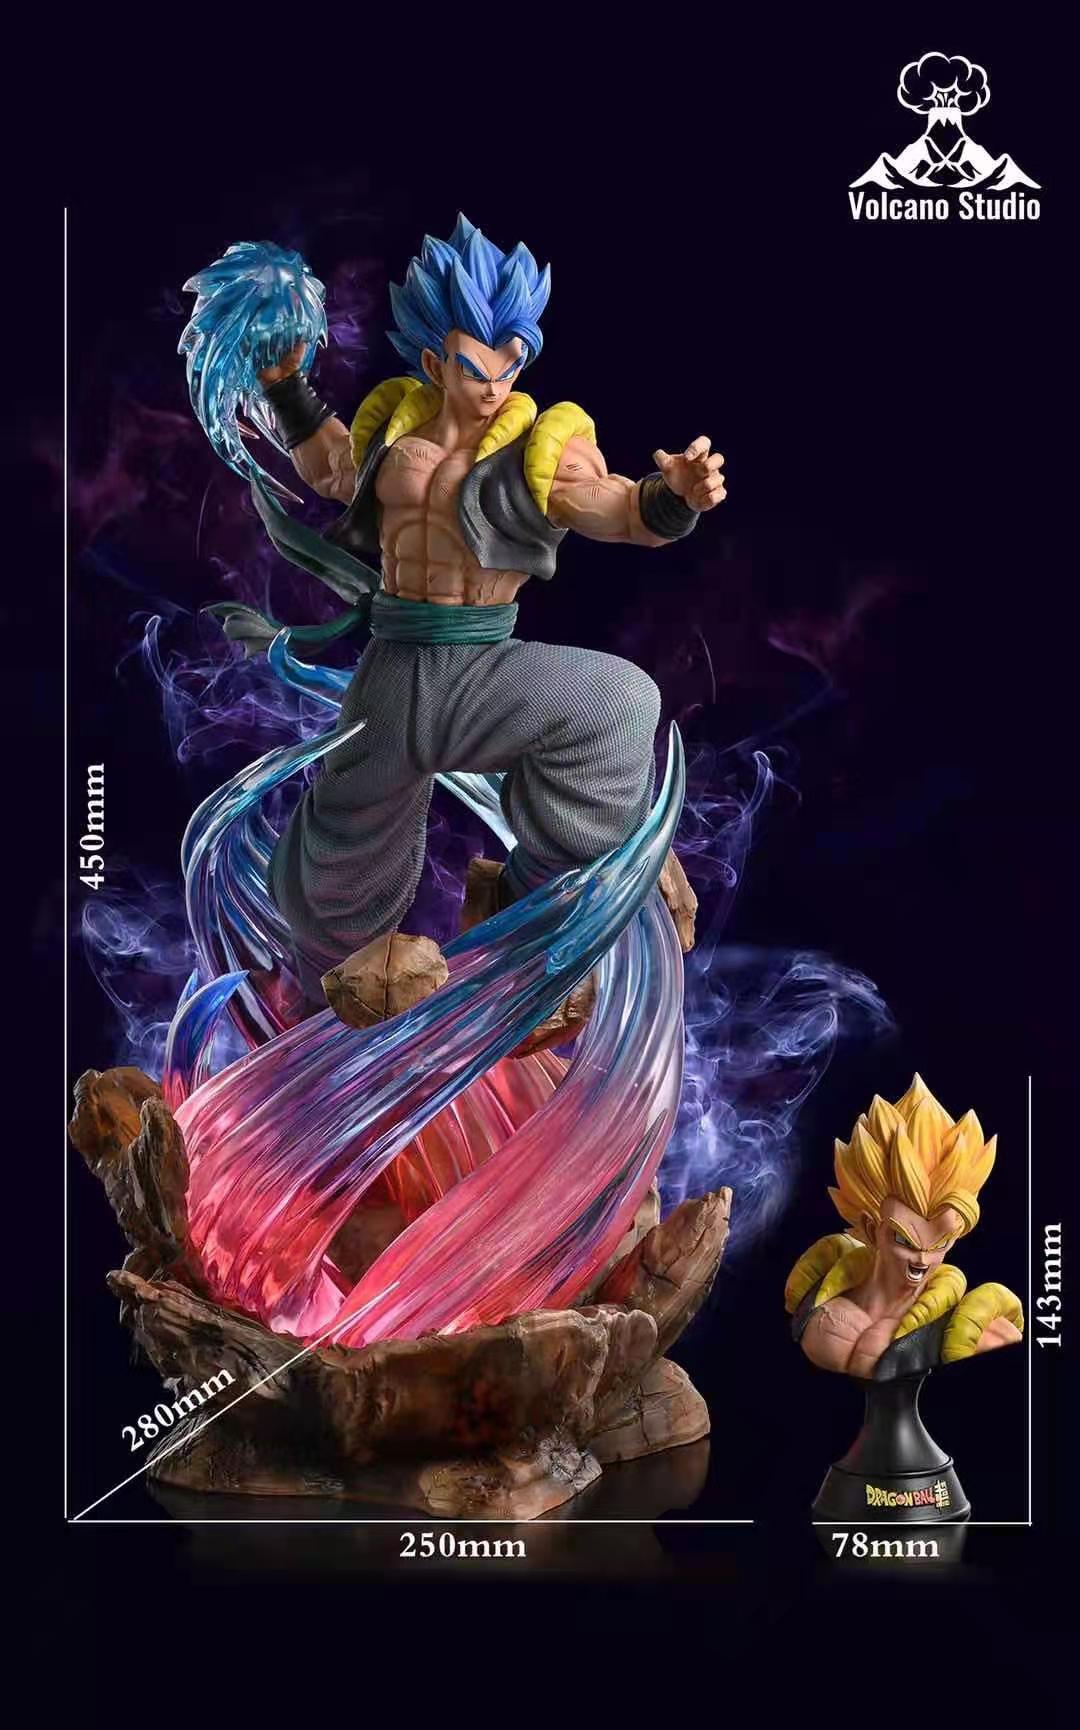 【Preorder】Volcano Studio Dragon Ball Super Battle Gogeta Resin Statue's Postcard